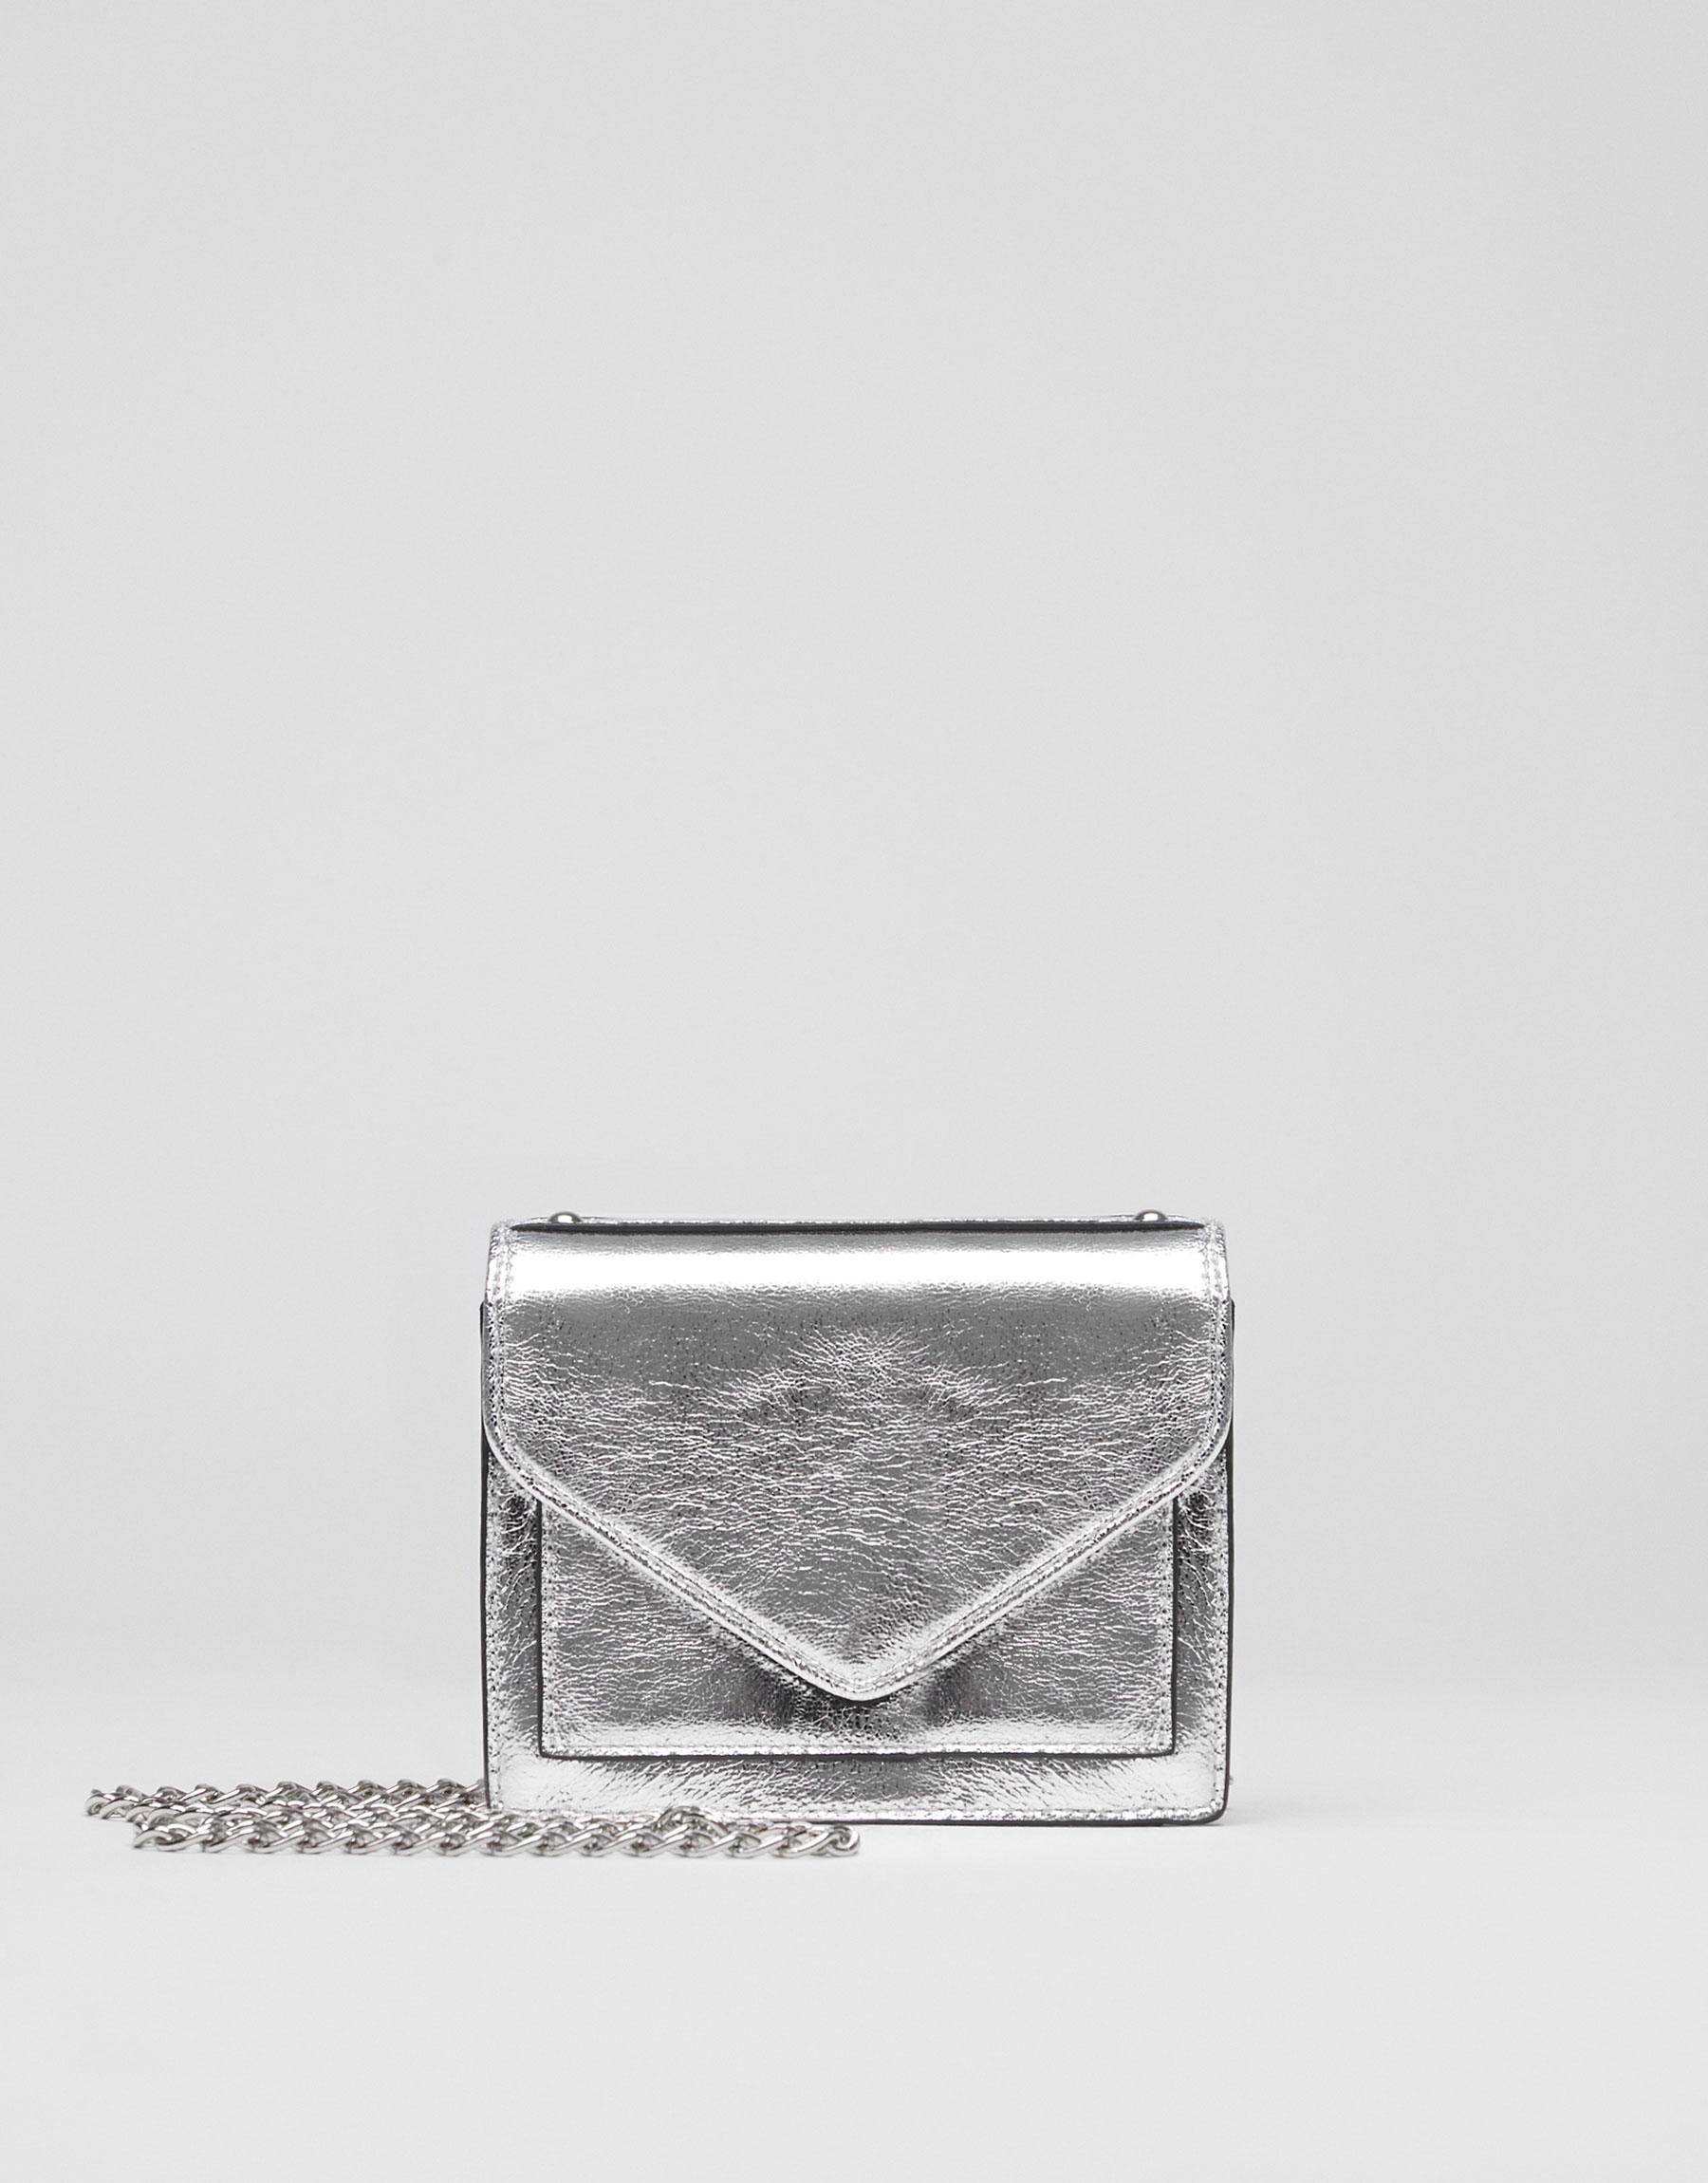 Mini silver evening crossbody bag